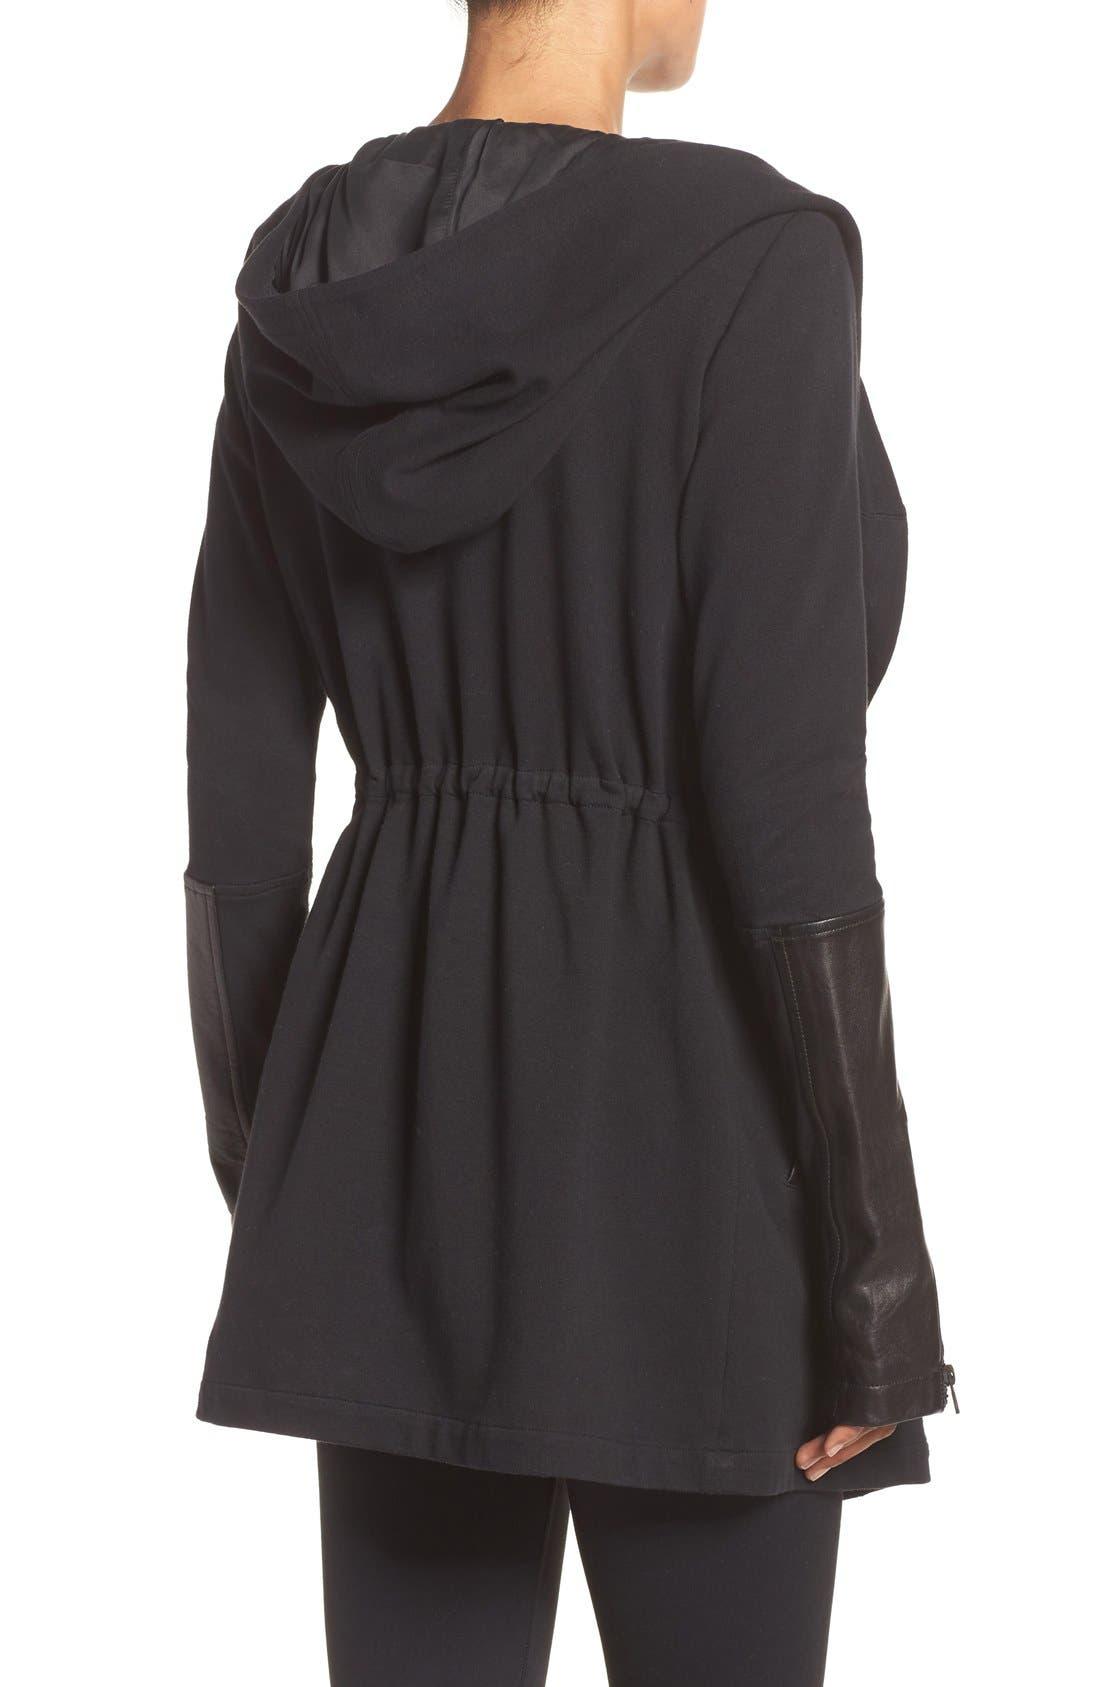 Traveler Wrap Jacket,                             Alternate thumbnail 10, color,                             BLACK/ BLACK